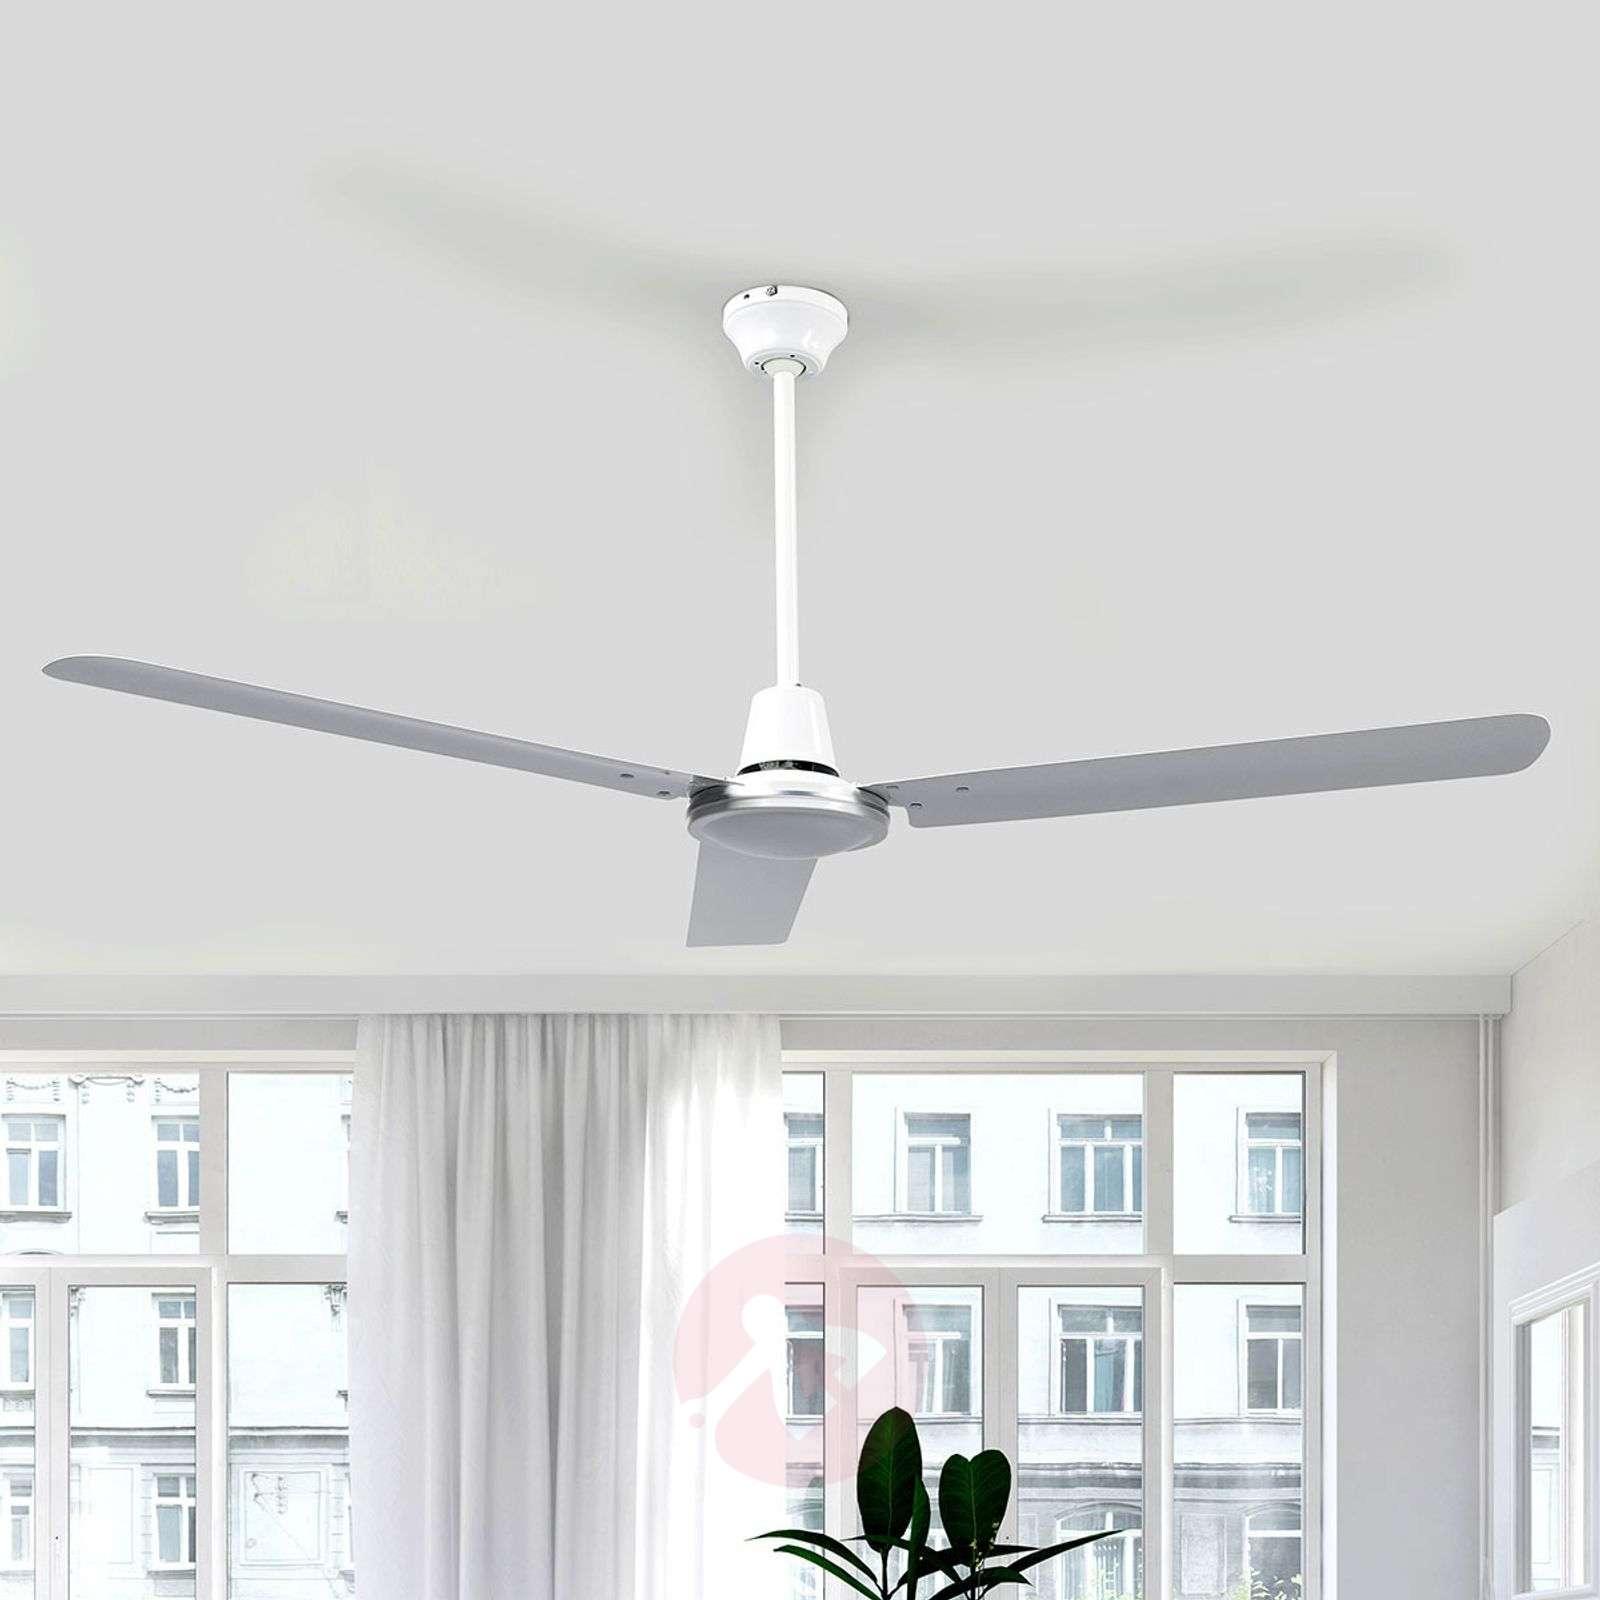 Dawinja three-blade, white ceiling fan-4018099-011